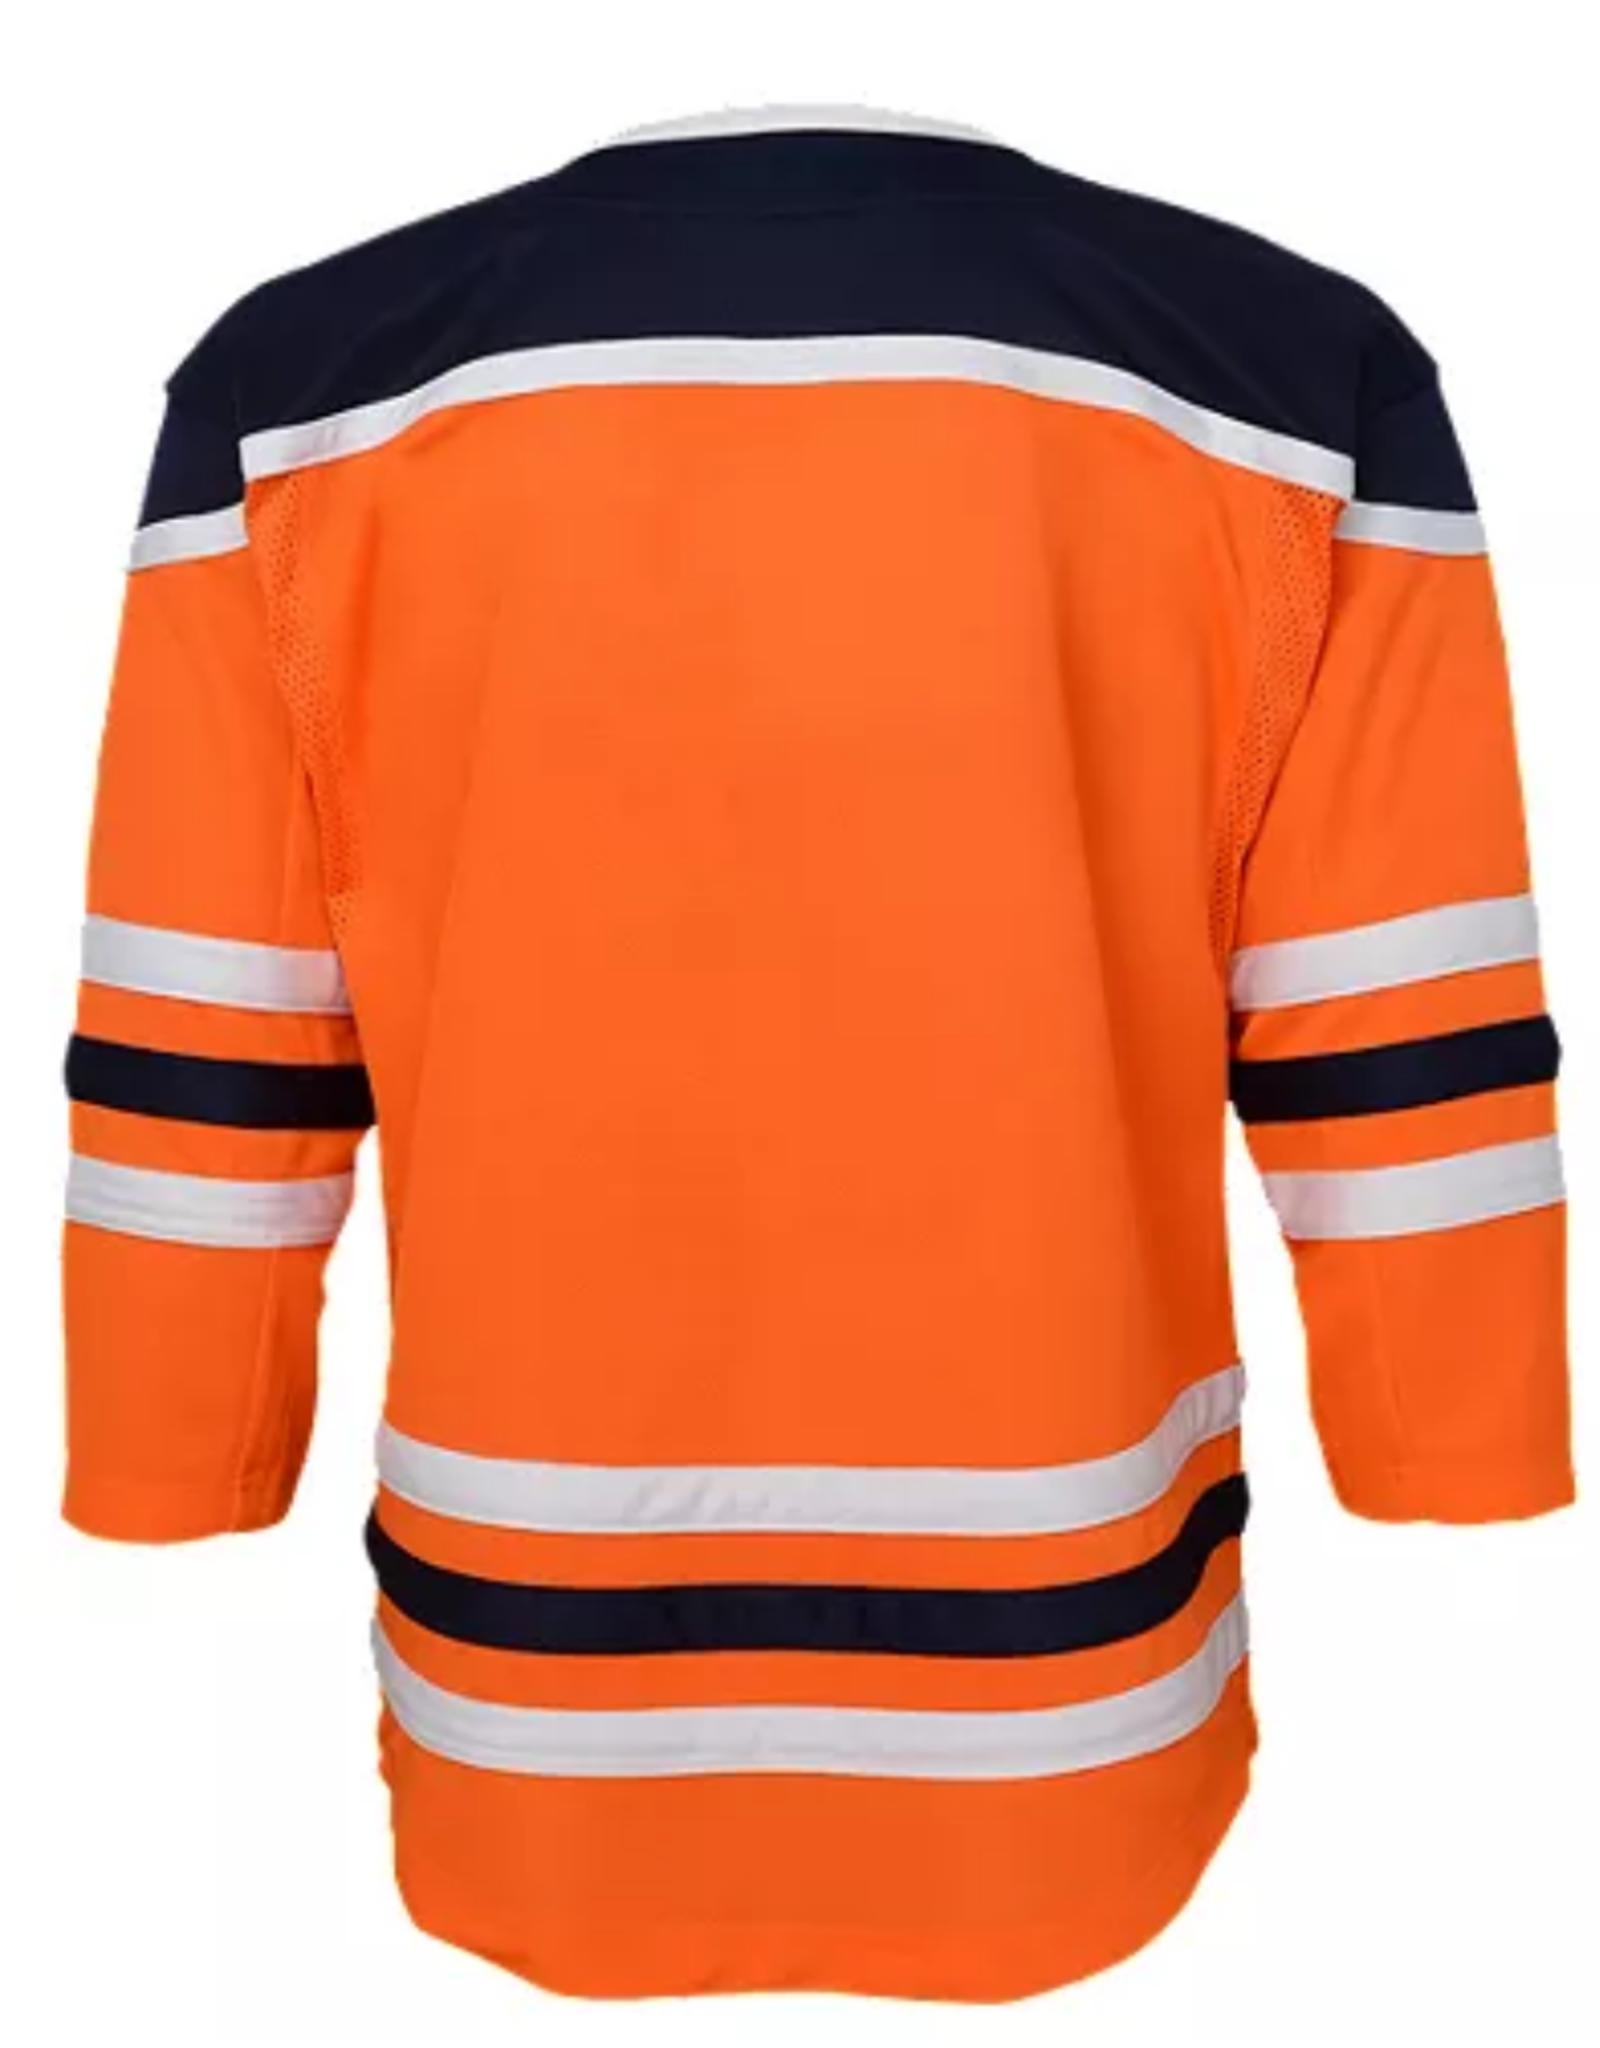 NHL Youth Premier Home Jersey Edmonton Oilers Orange